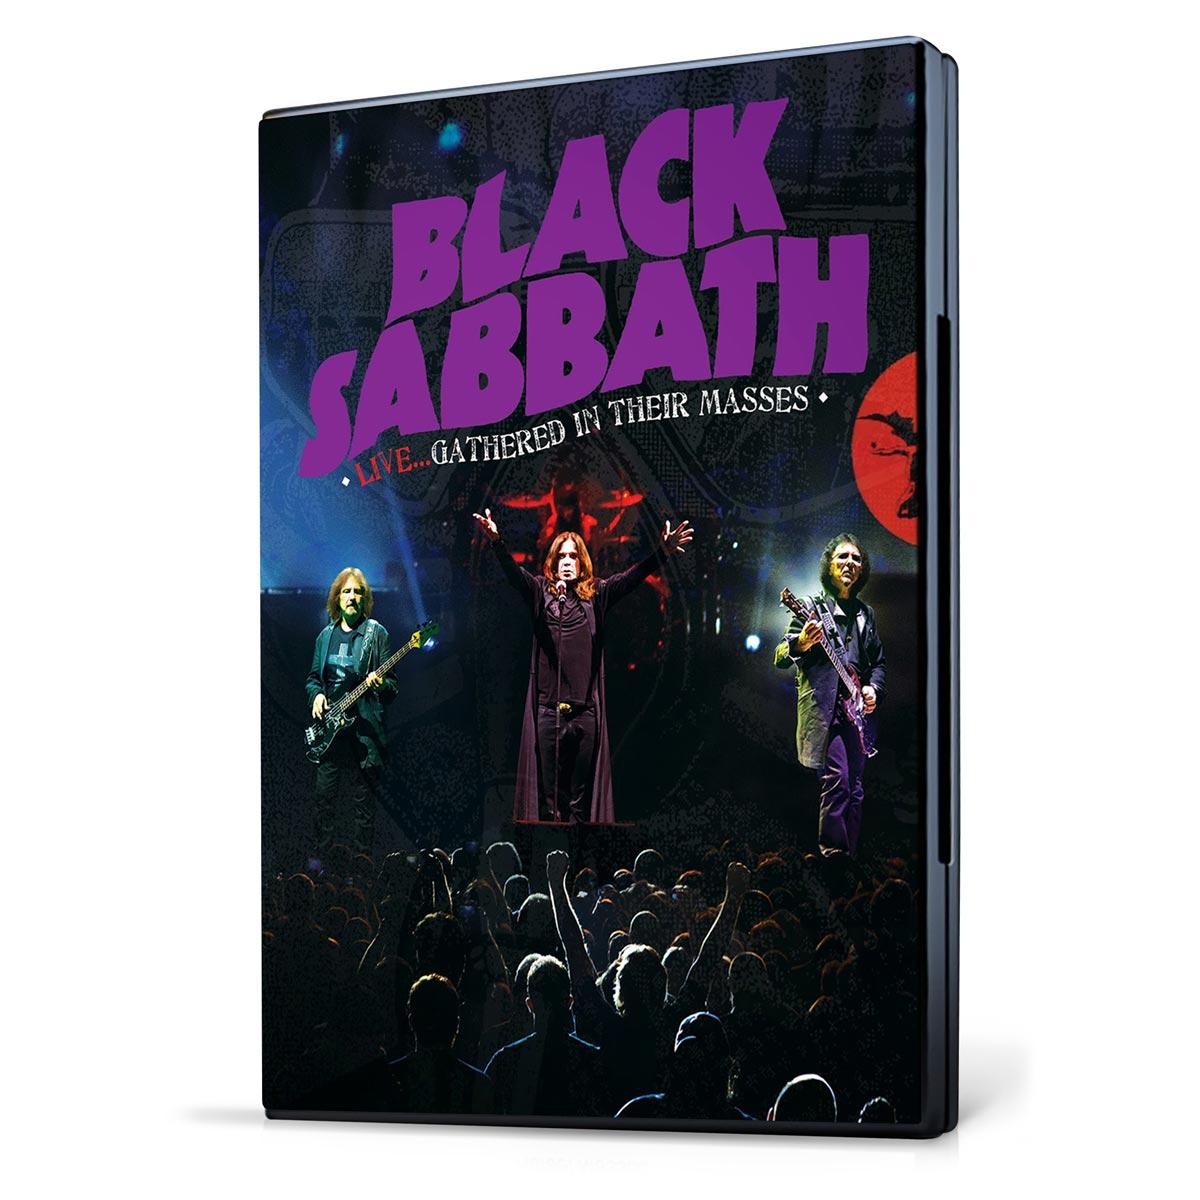 DVD Black Sabbath Live... Gathered In Their Masses